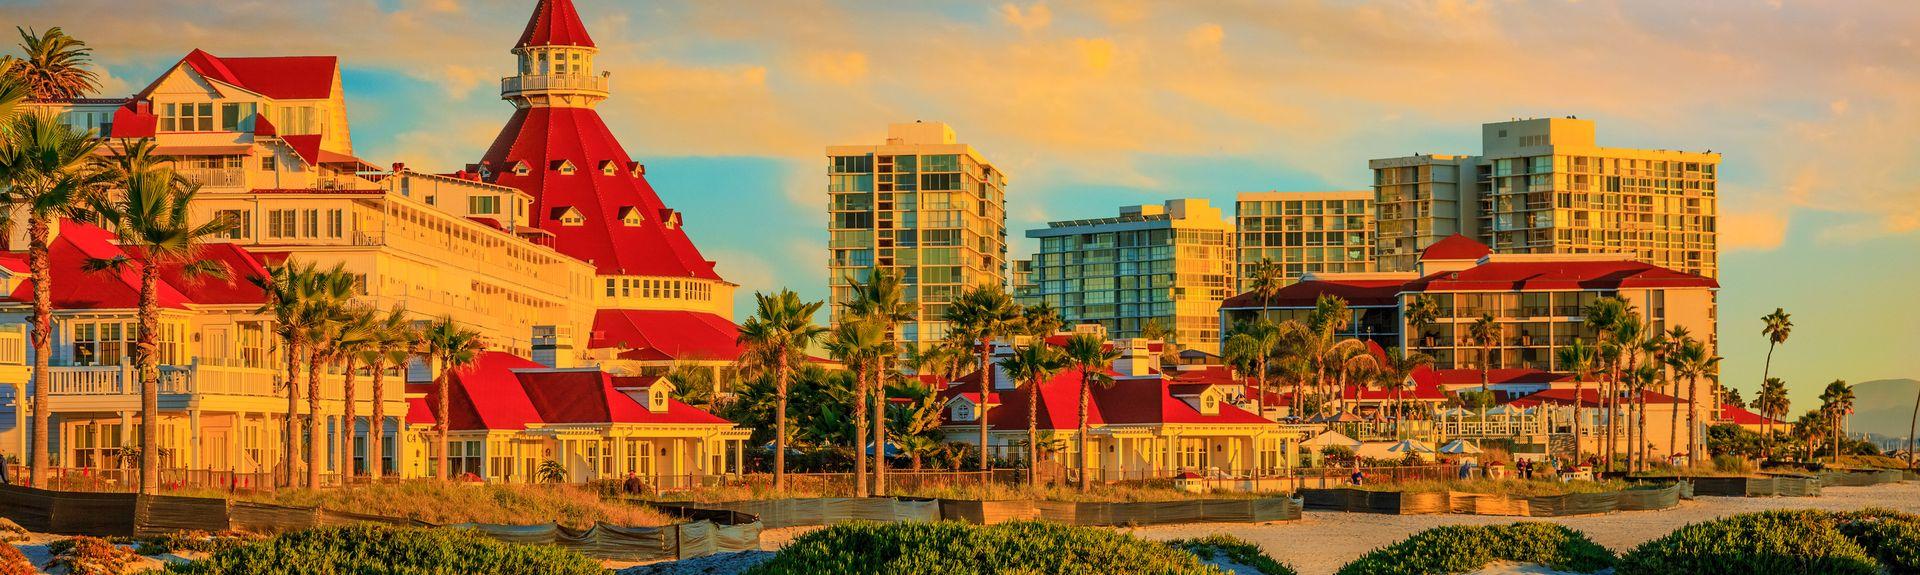 Coronado Beach vacation rentals: Houses & more | HomeAway